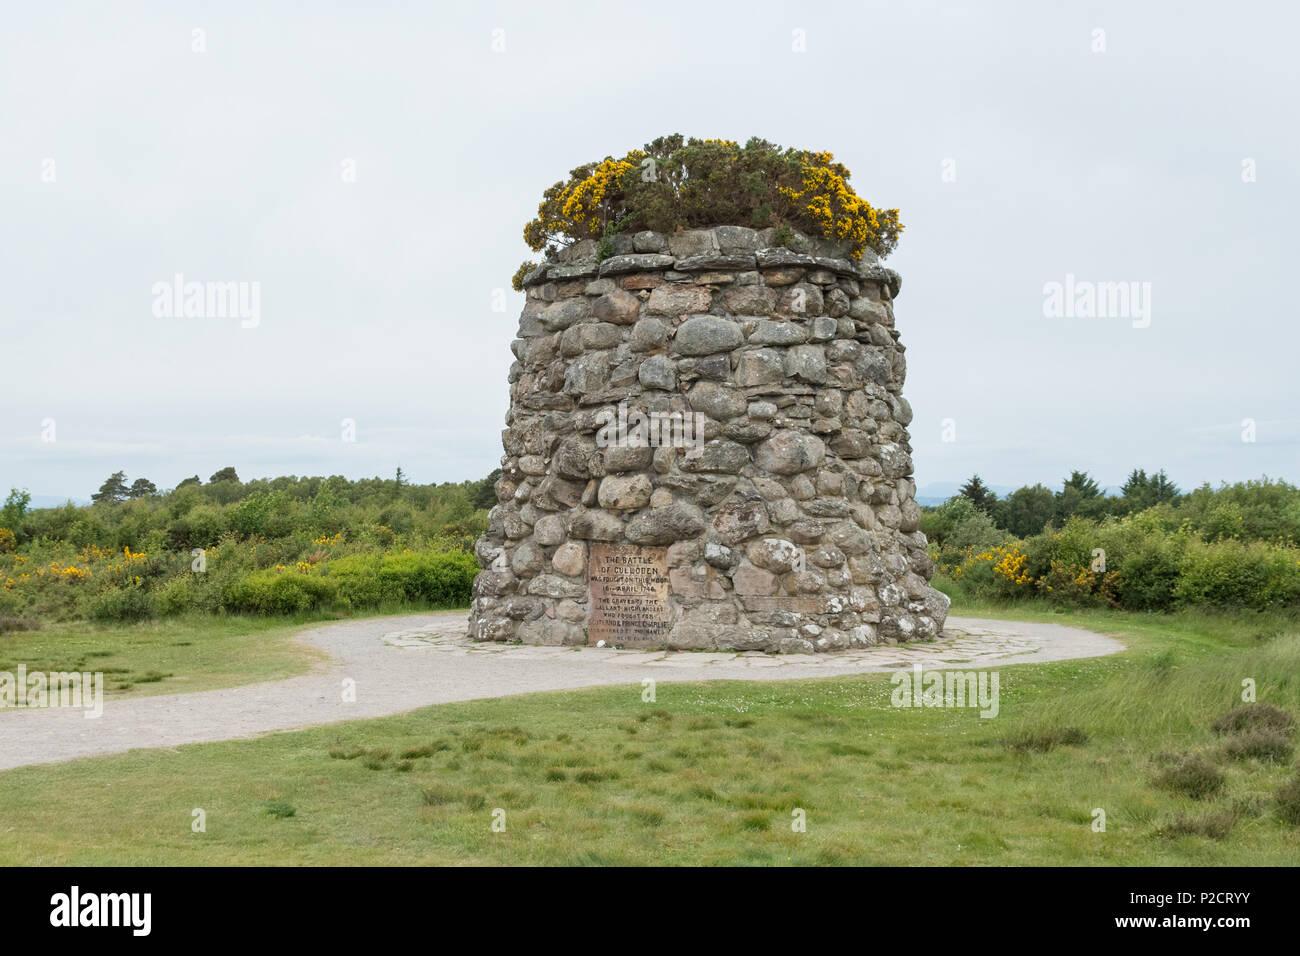 Jacobite Memorial Cairn, Culloden Moor, Culloden Battlefield, Scotland, UK - Stock Image